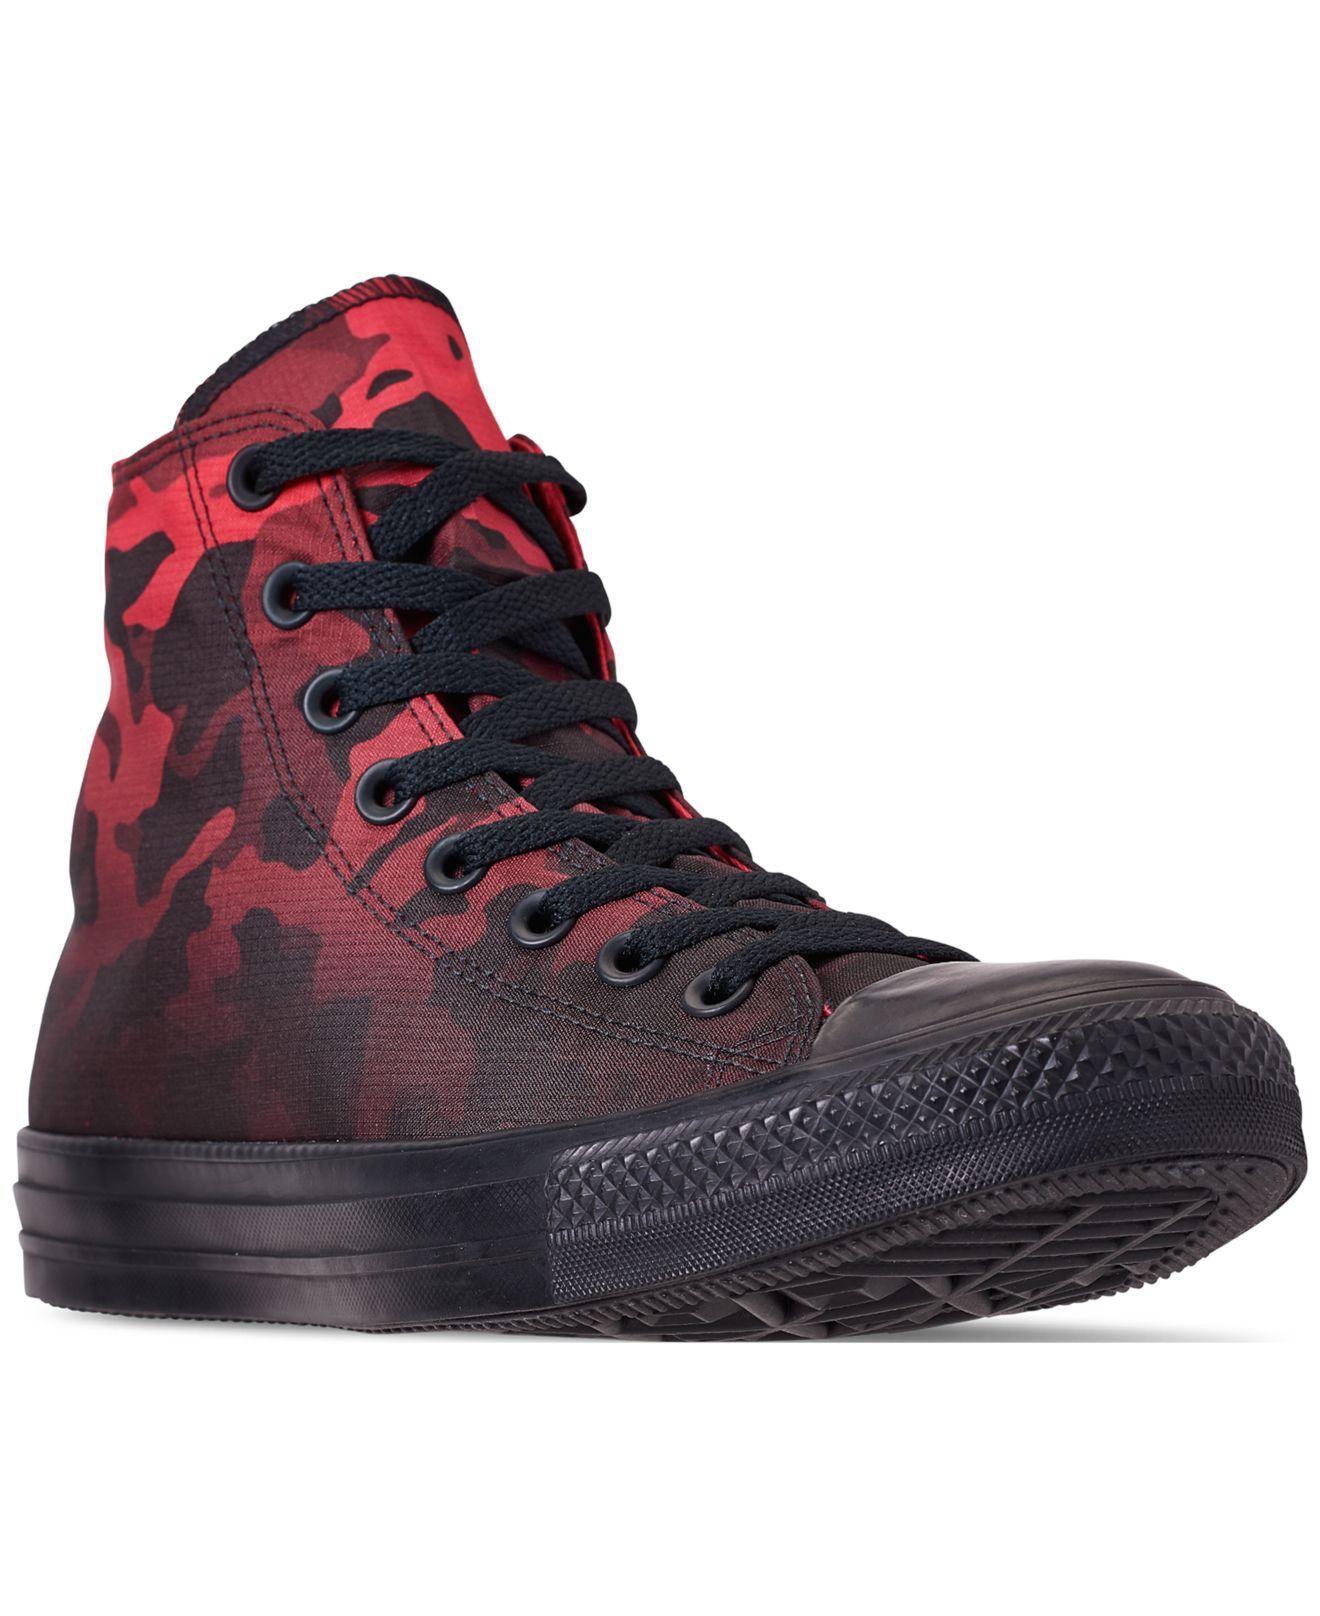 5ef1f7ab117e Converse. Men s Black Chuck Taylor All Star Gradient Camo High Top Casual  Sneakers ...